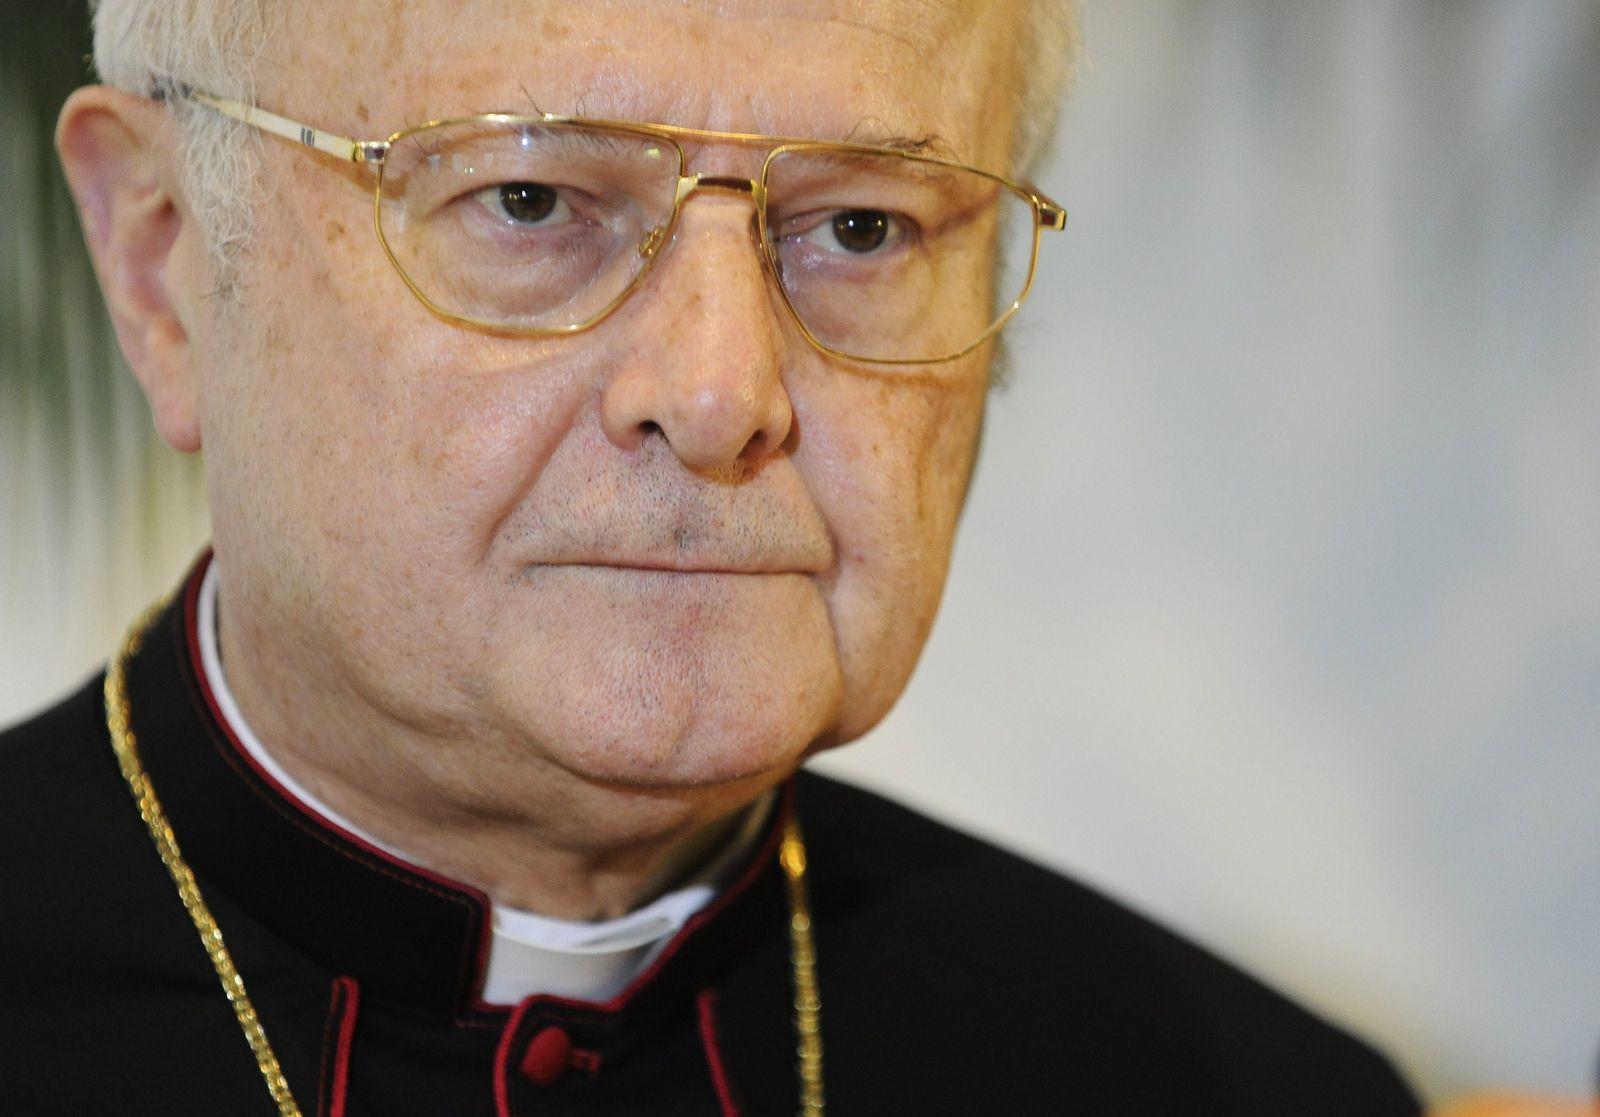 Krisengipfel im Vatikan: Papst «tief erschüttert»